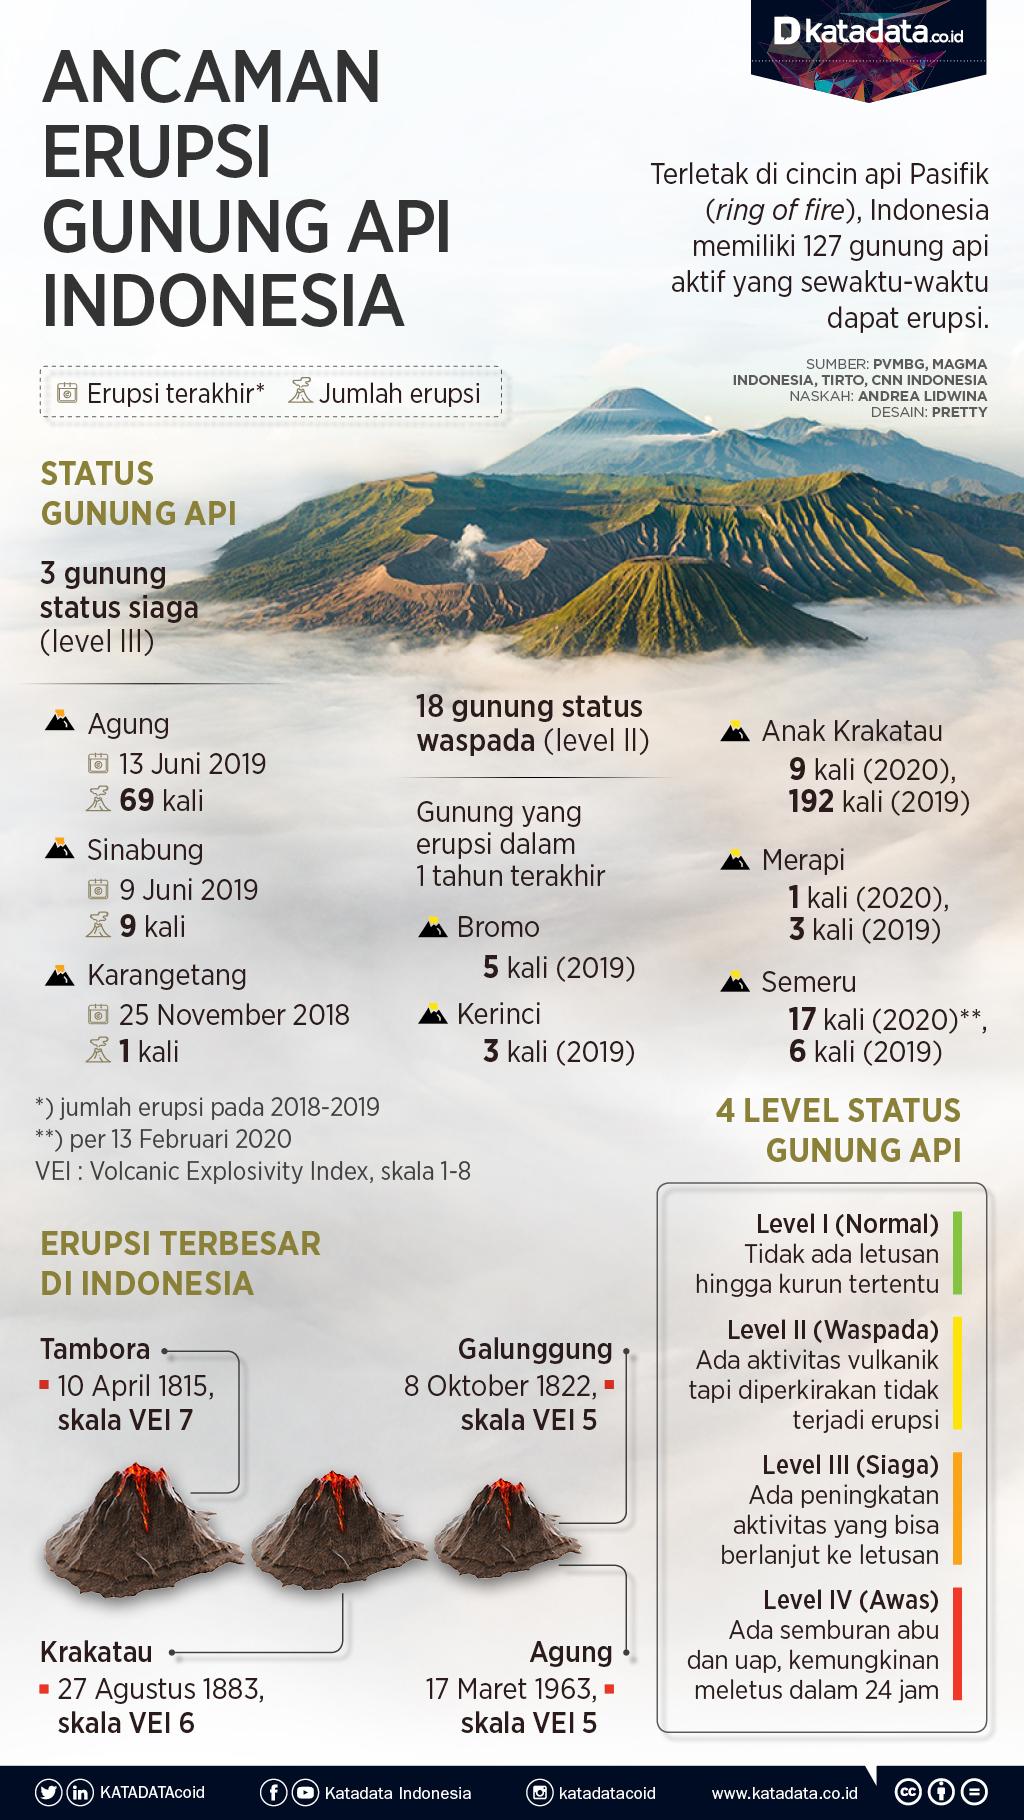 Ancaman Erupsi Gunung Api Di Indonesia Infografik Katadata Co Id